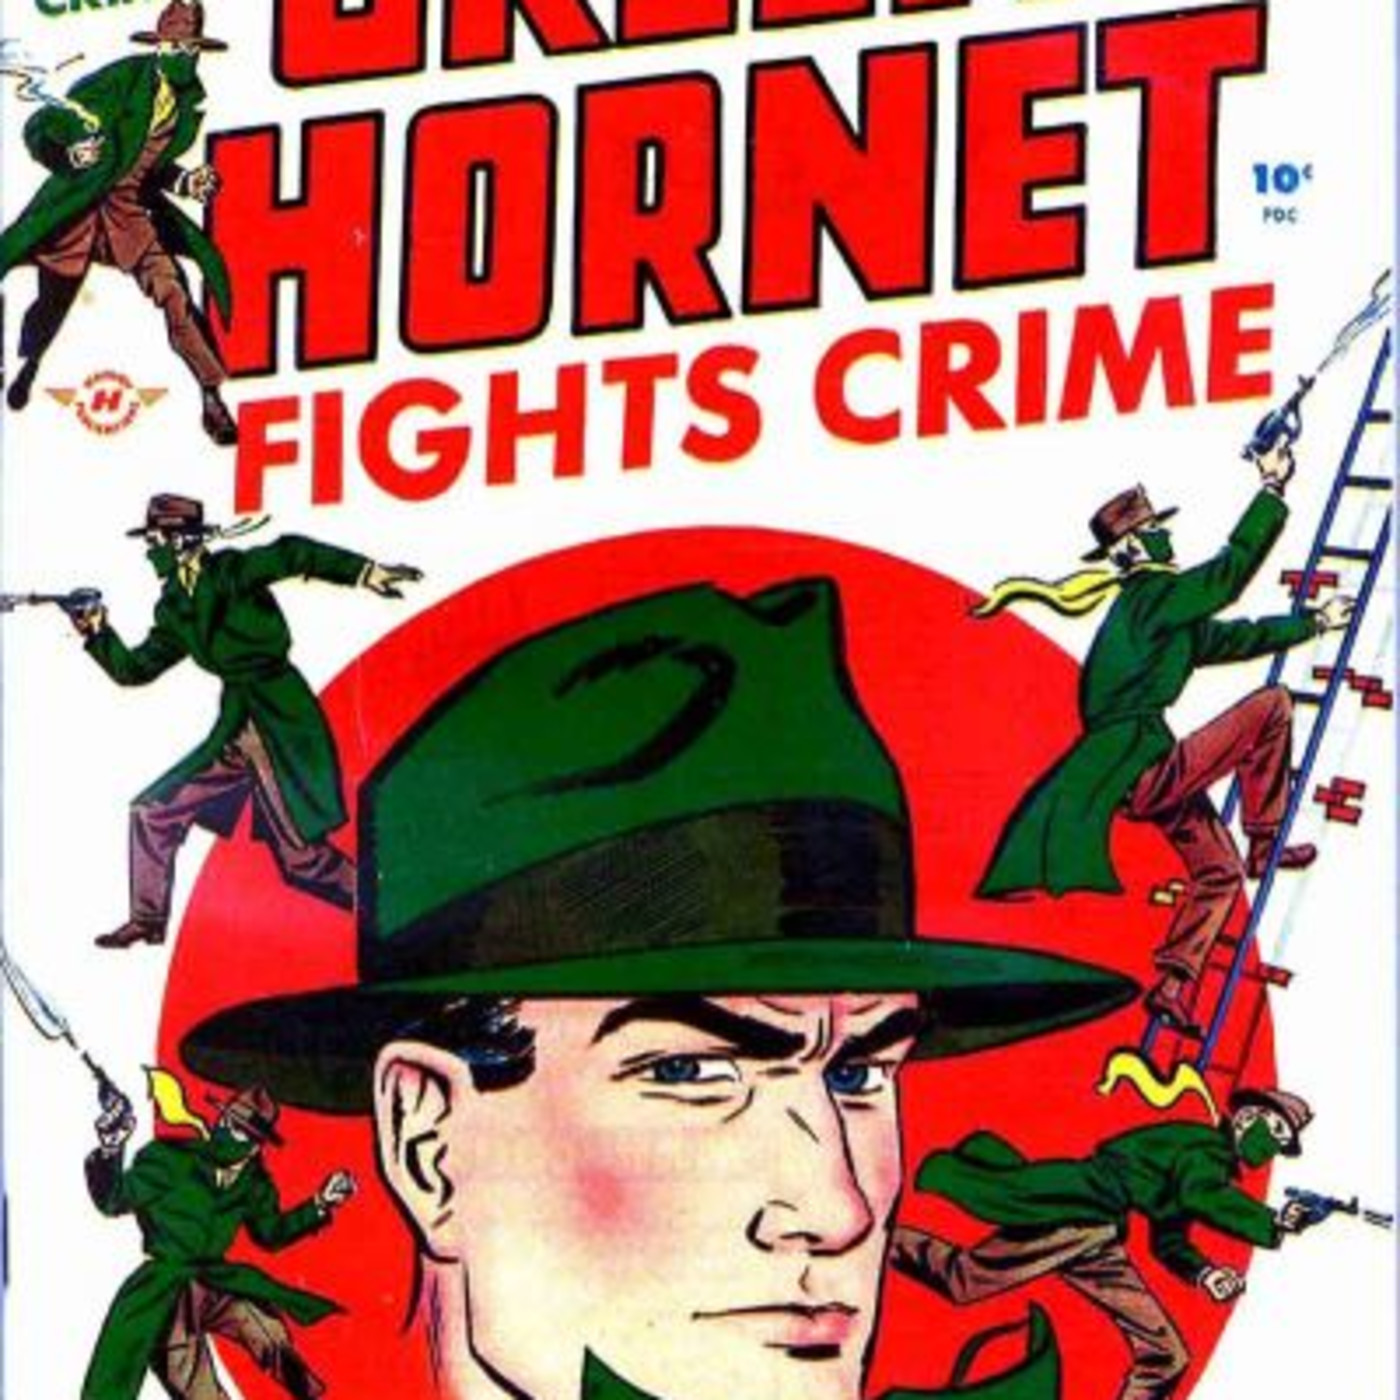 The Green Hornet - 00 - 451108 Drops A Hint.mp3